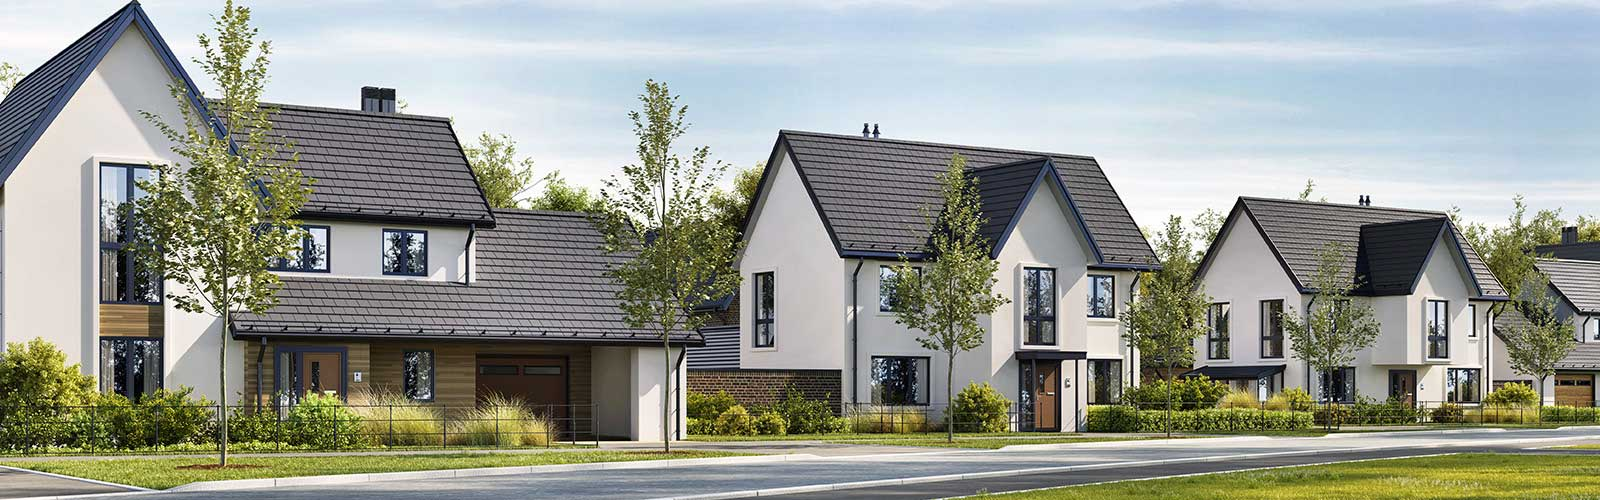 3 moderne Häuser